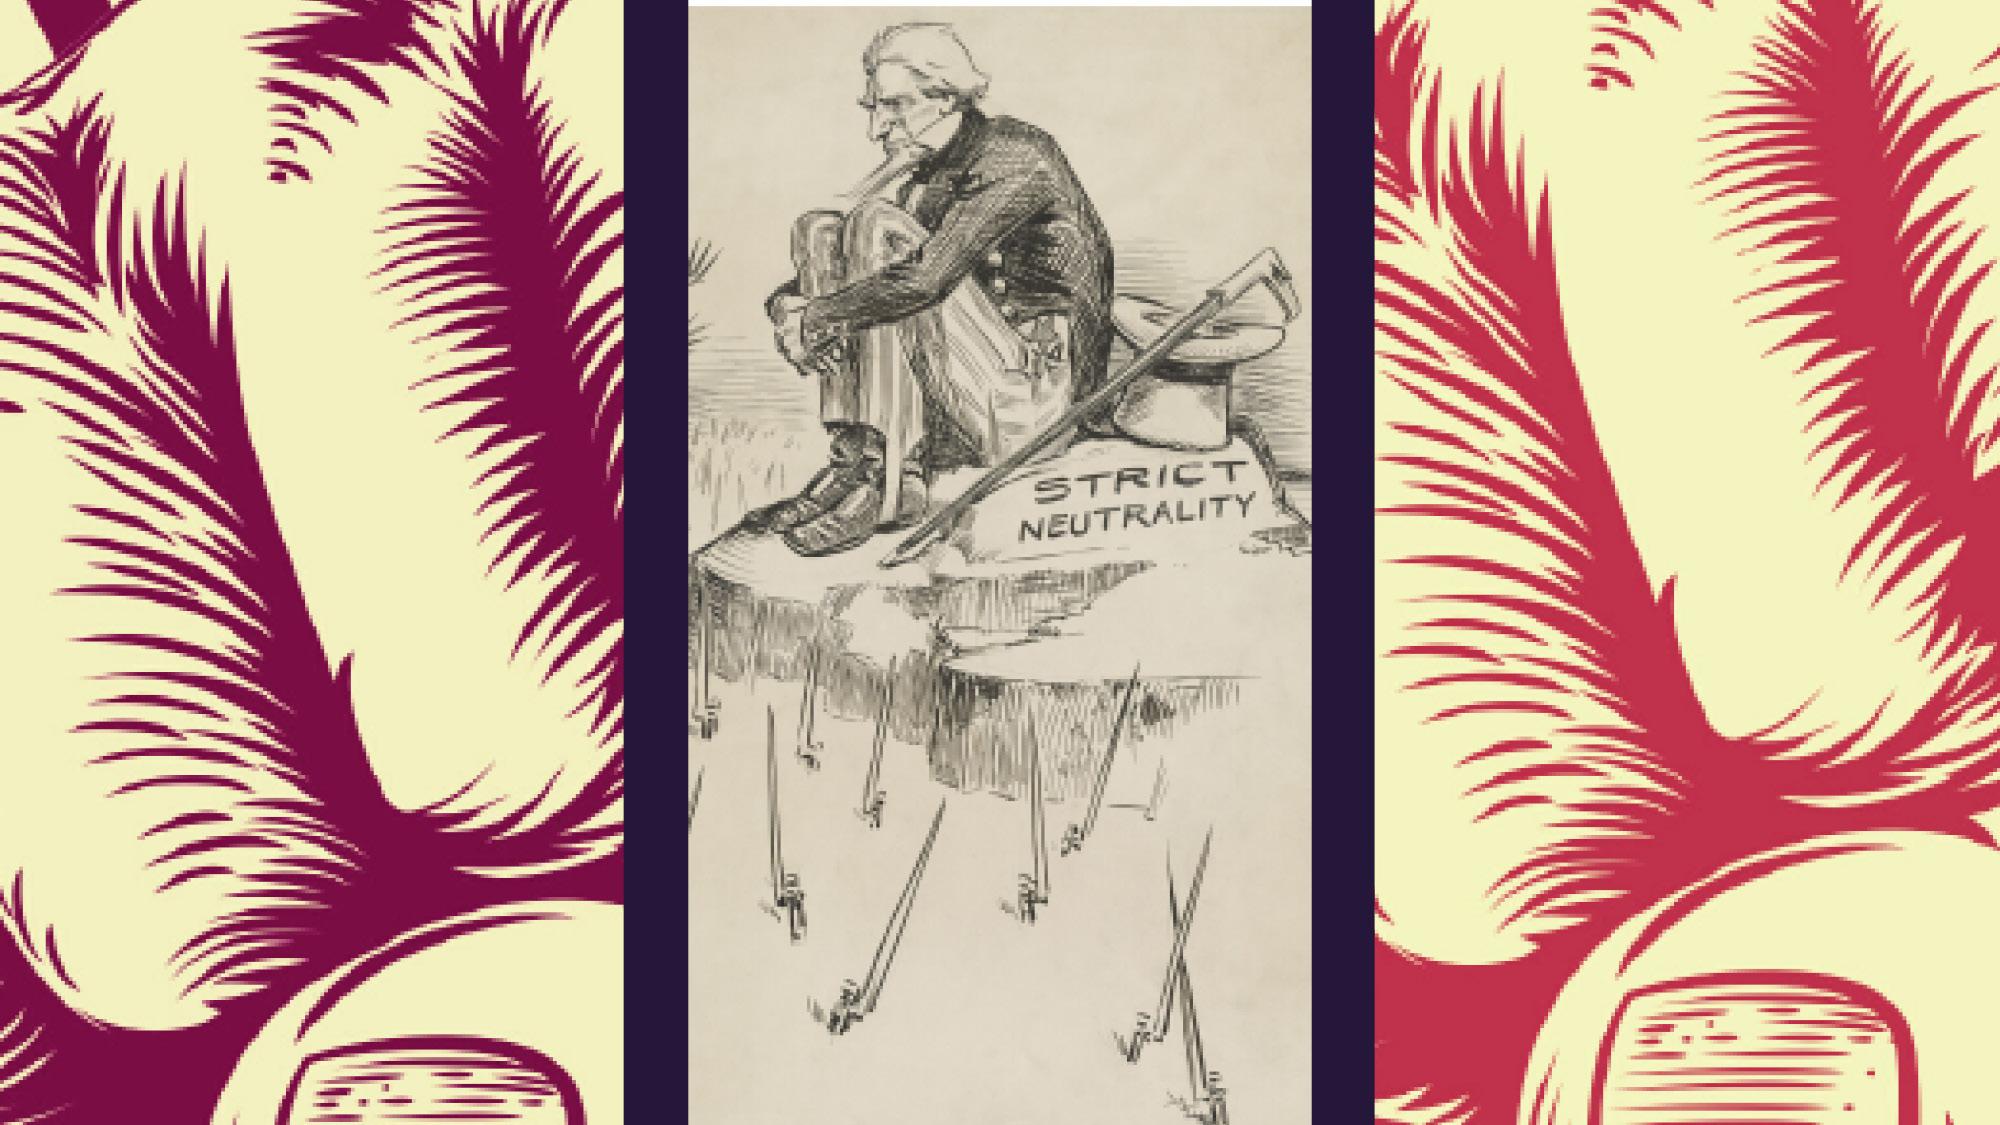 Propaganda and neutrality Conference